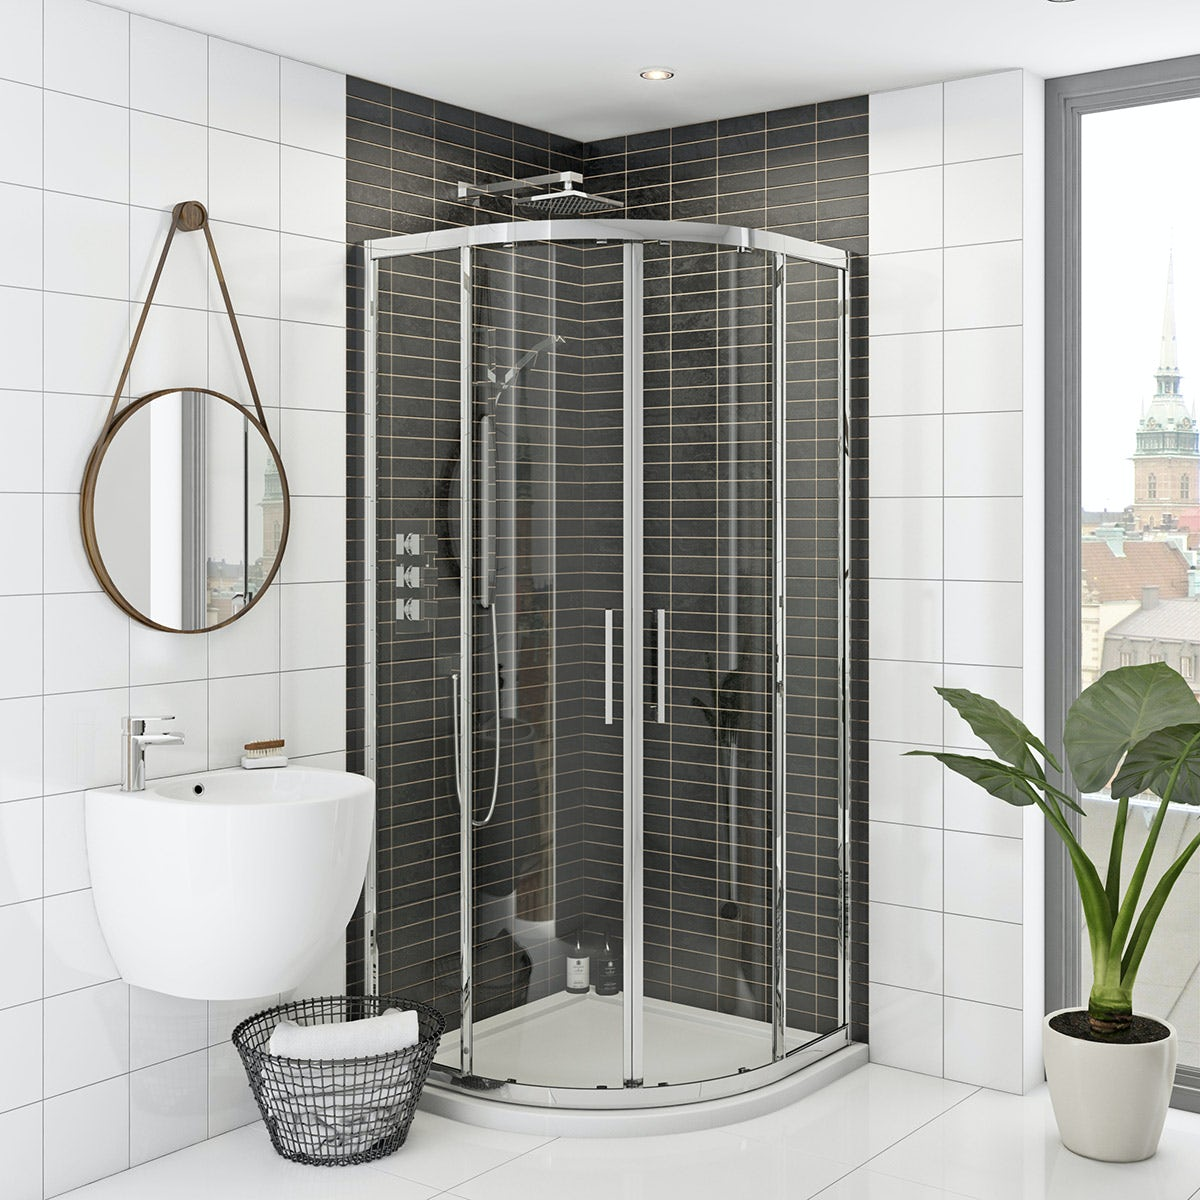 Hardy 8mm easy clean sliding quadrant shower enclosure